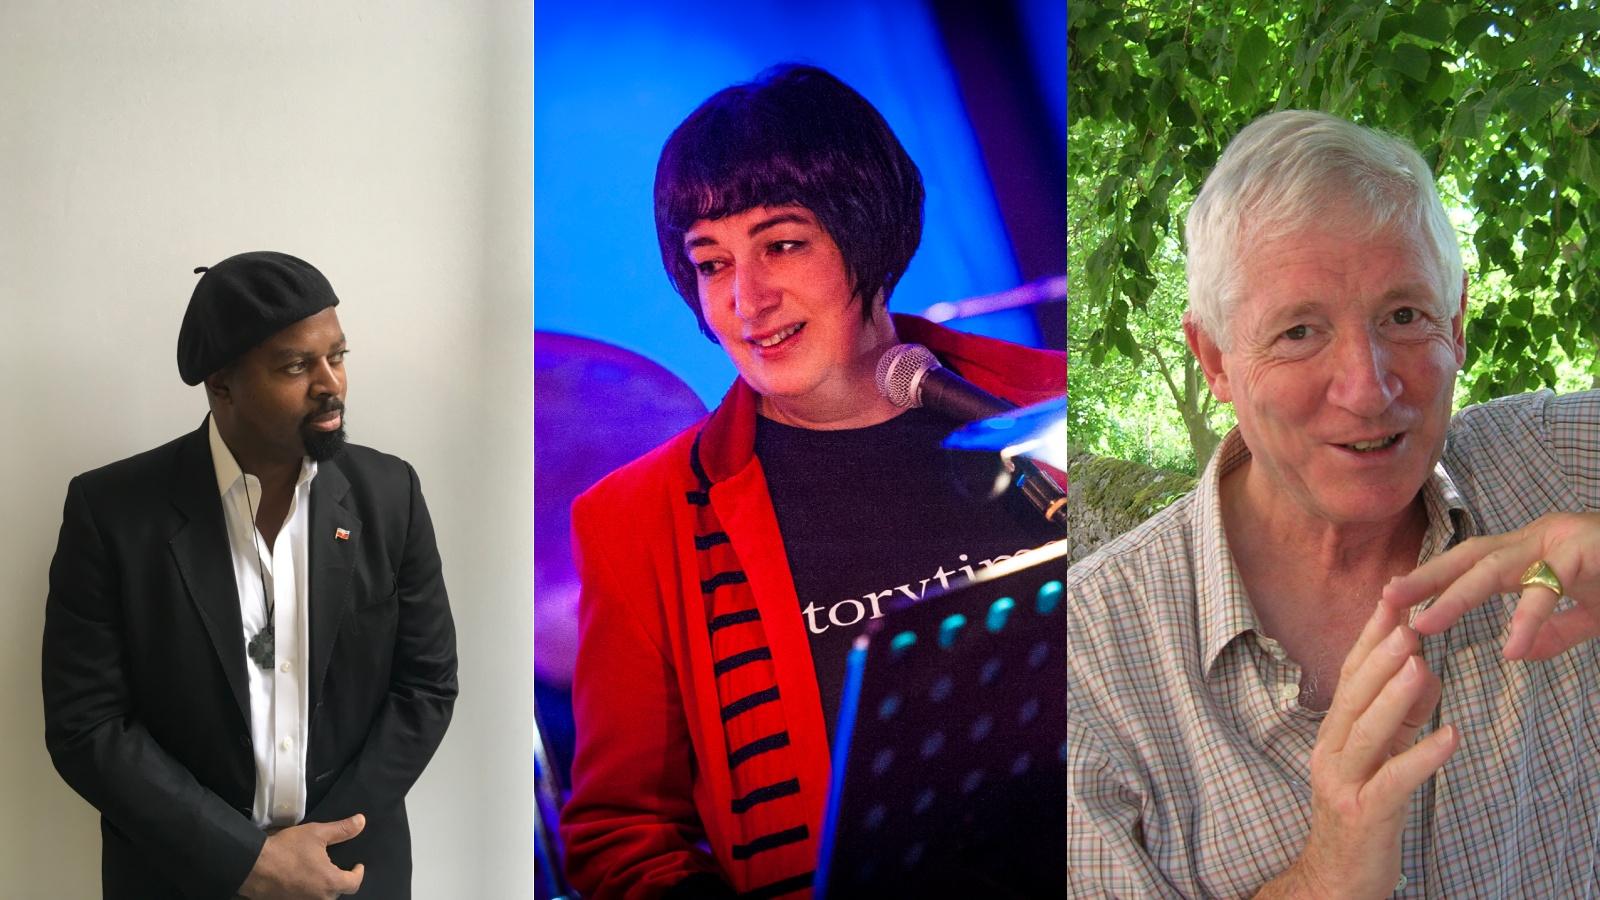 Portraits of Ben Okri OBE, Joanne Harris MBE and Kevin Crossley-Holland